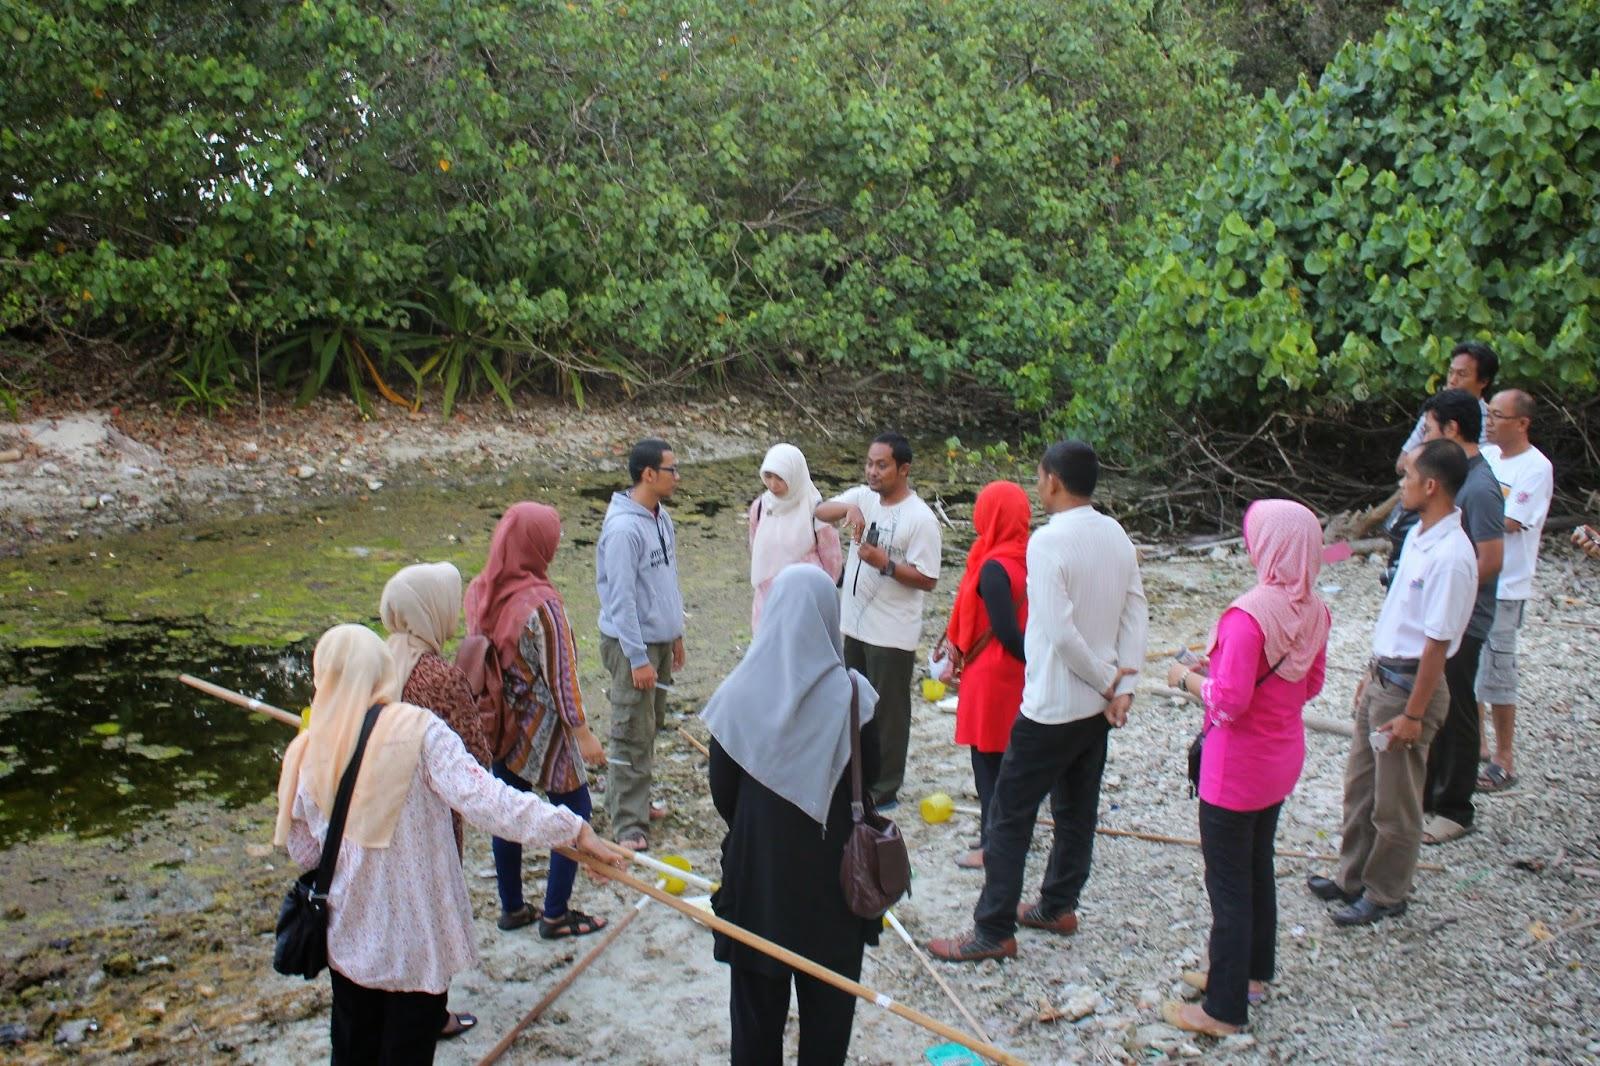 Kunjungan Wisata Ilmiah Mahasiswa Fakultas Kedokteran Unpad Bandung